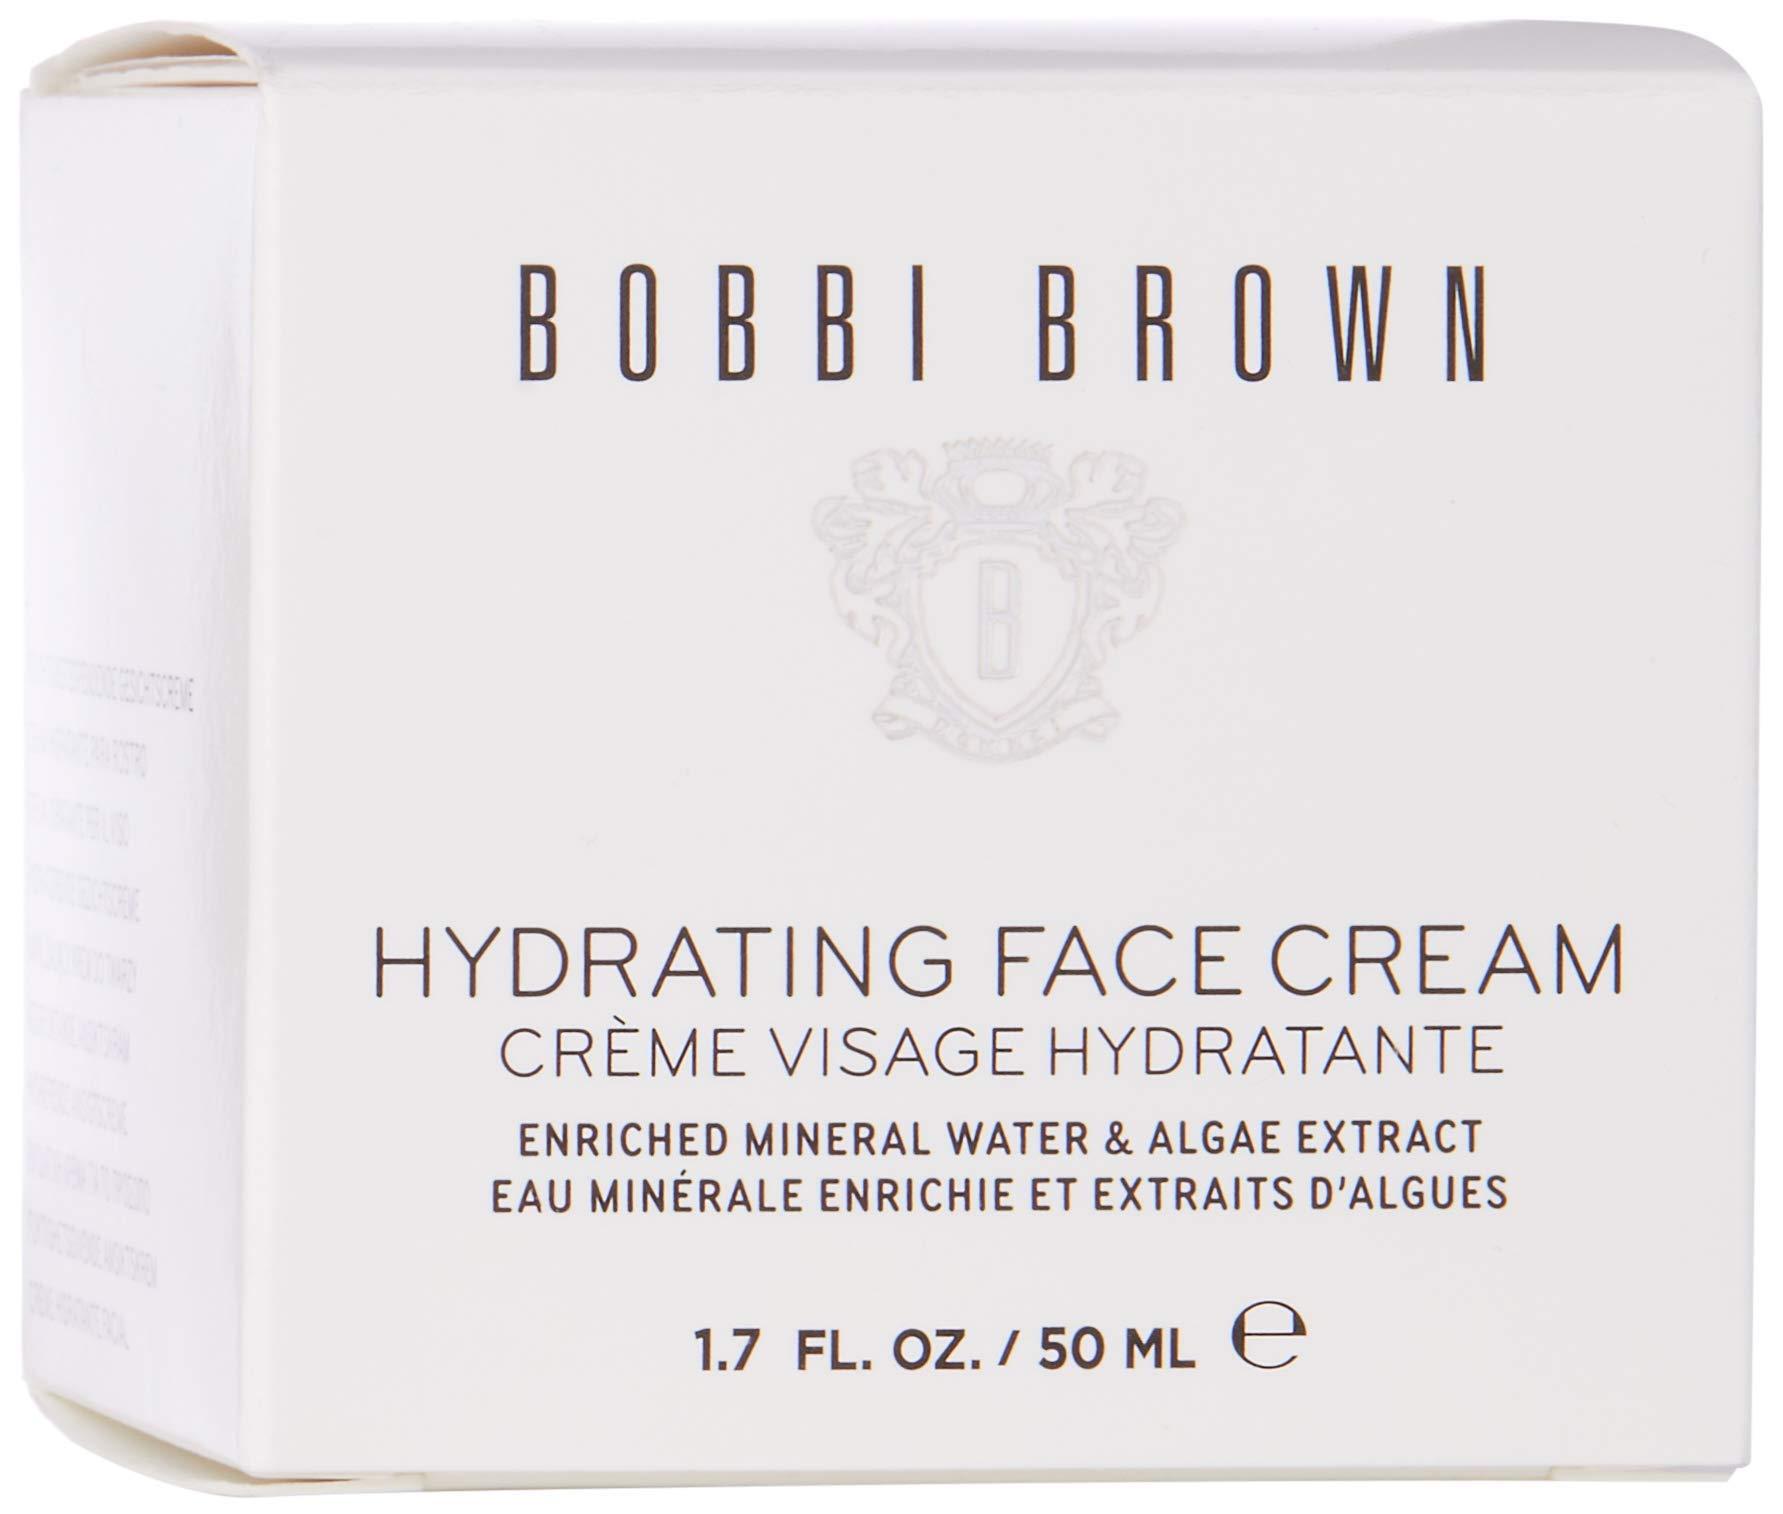 Bobbi Brown Vitamin Enriched Face Base, 1.7oz./50ml - Moisturizer and Primer in One